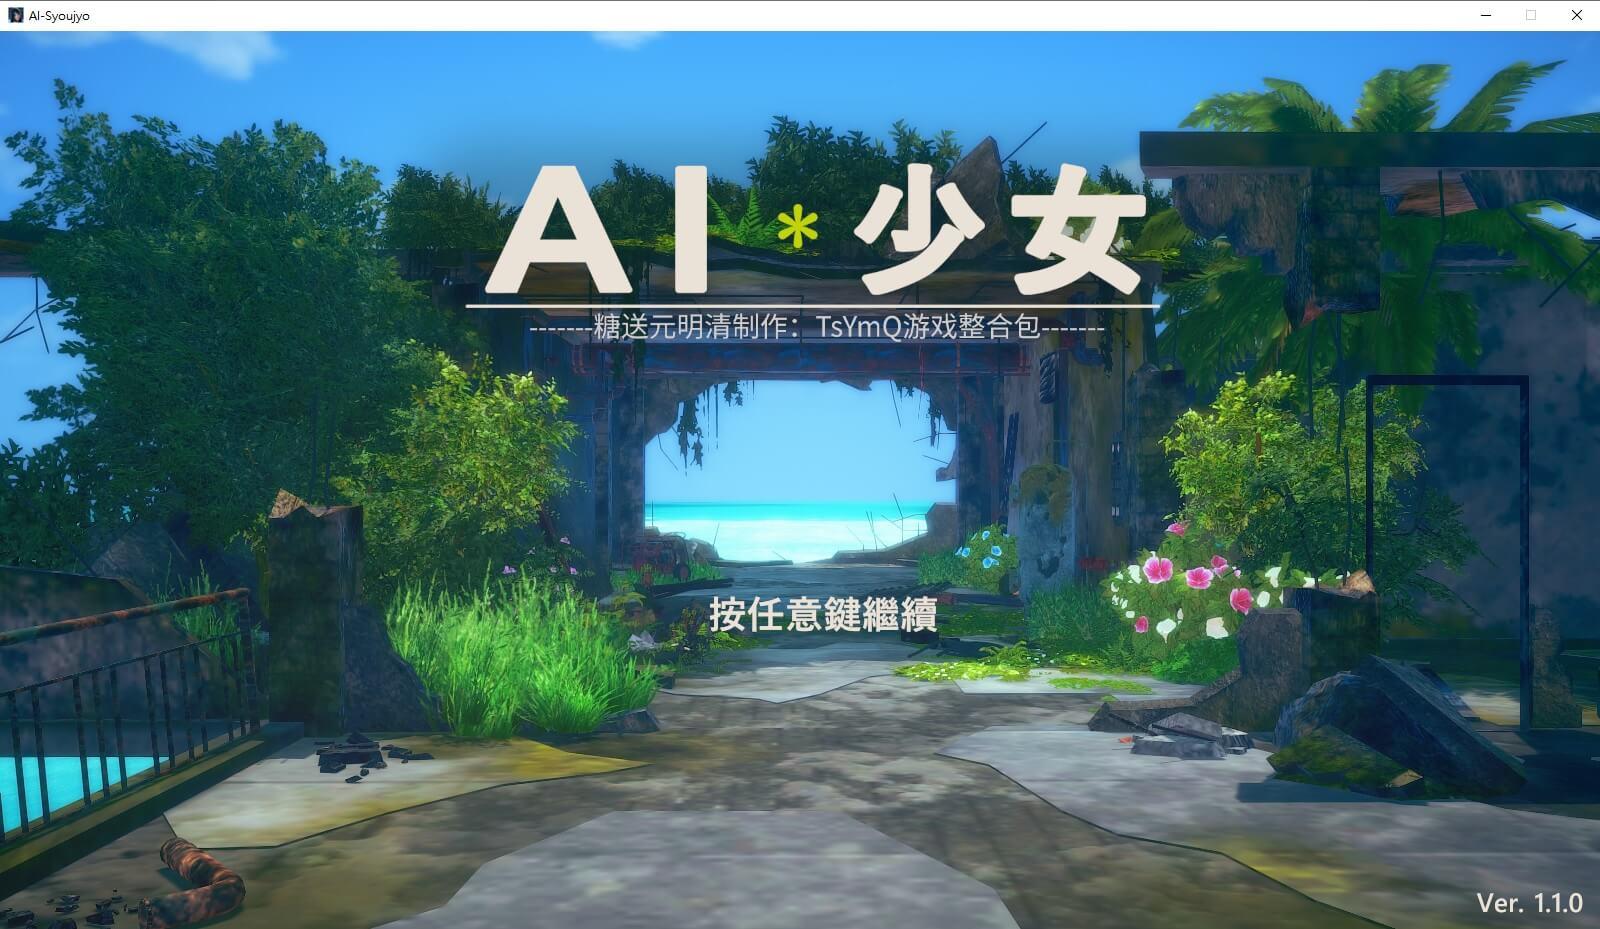 AI少女糖送元明清V1.10最全MOD版六月中文整合